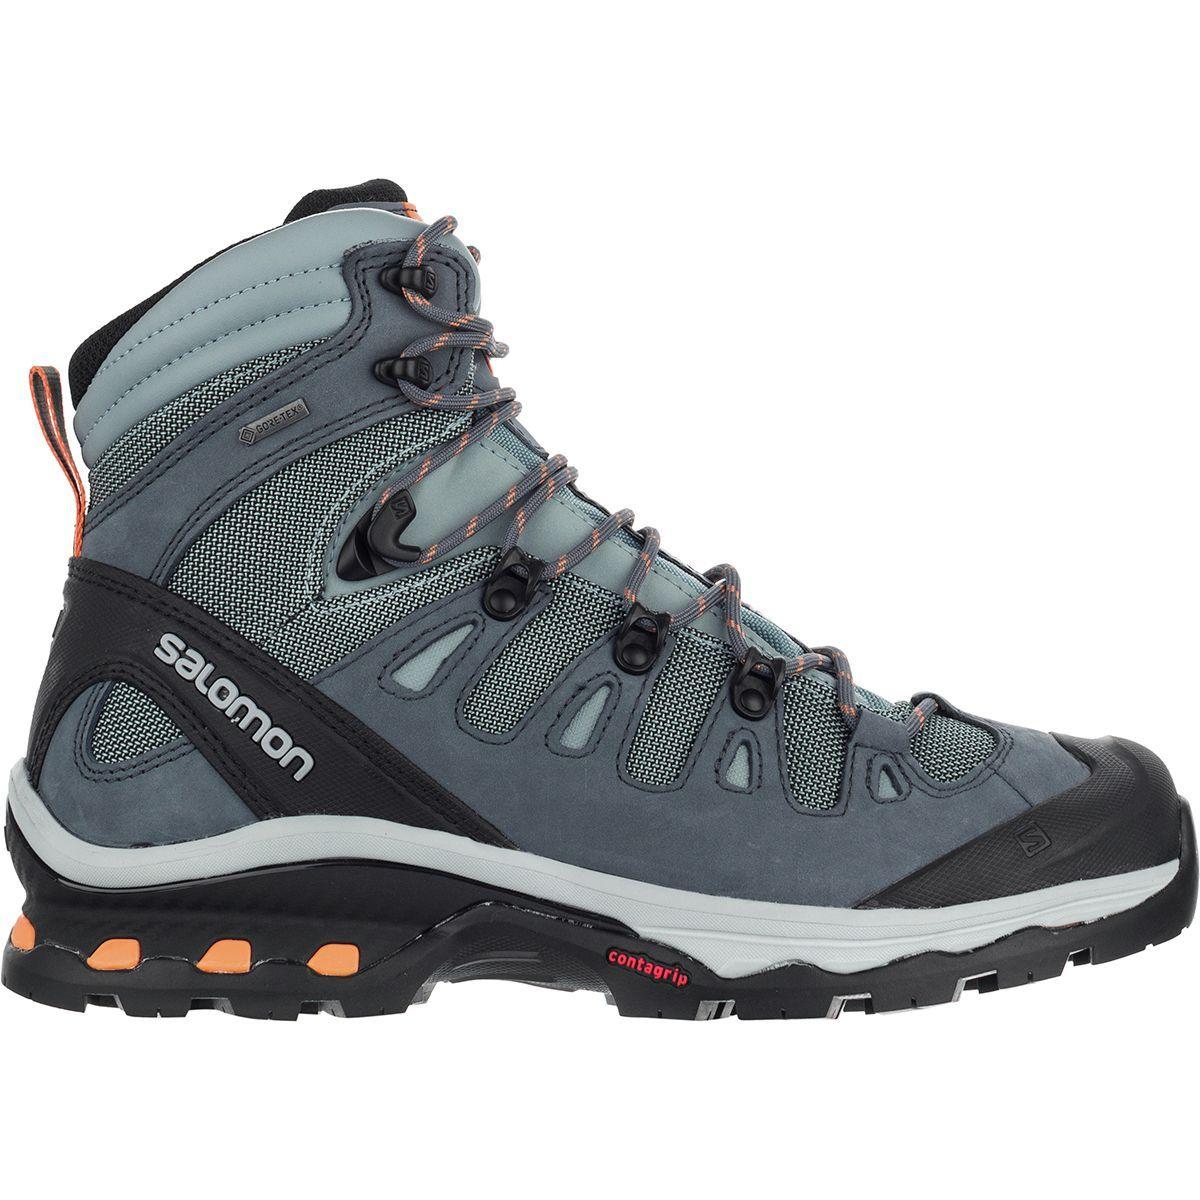 Salomon Quest 4D 3 GTX Backpacking Boot - Women's in 2020 ...